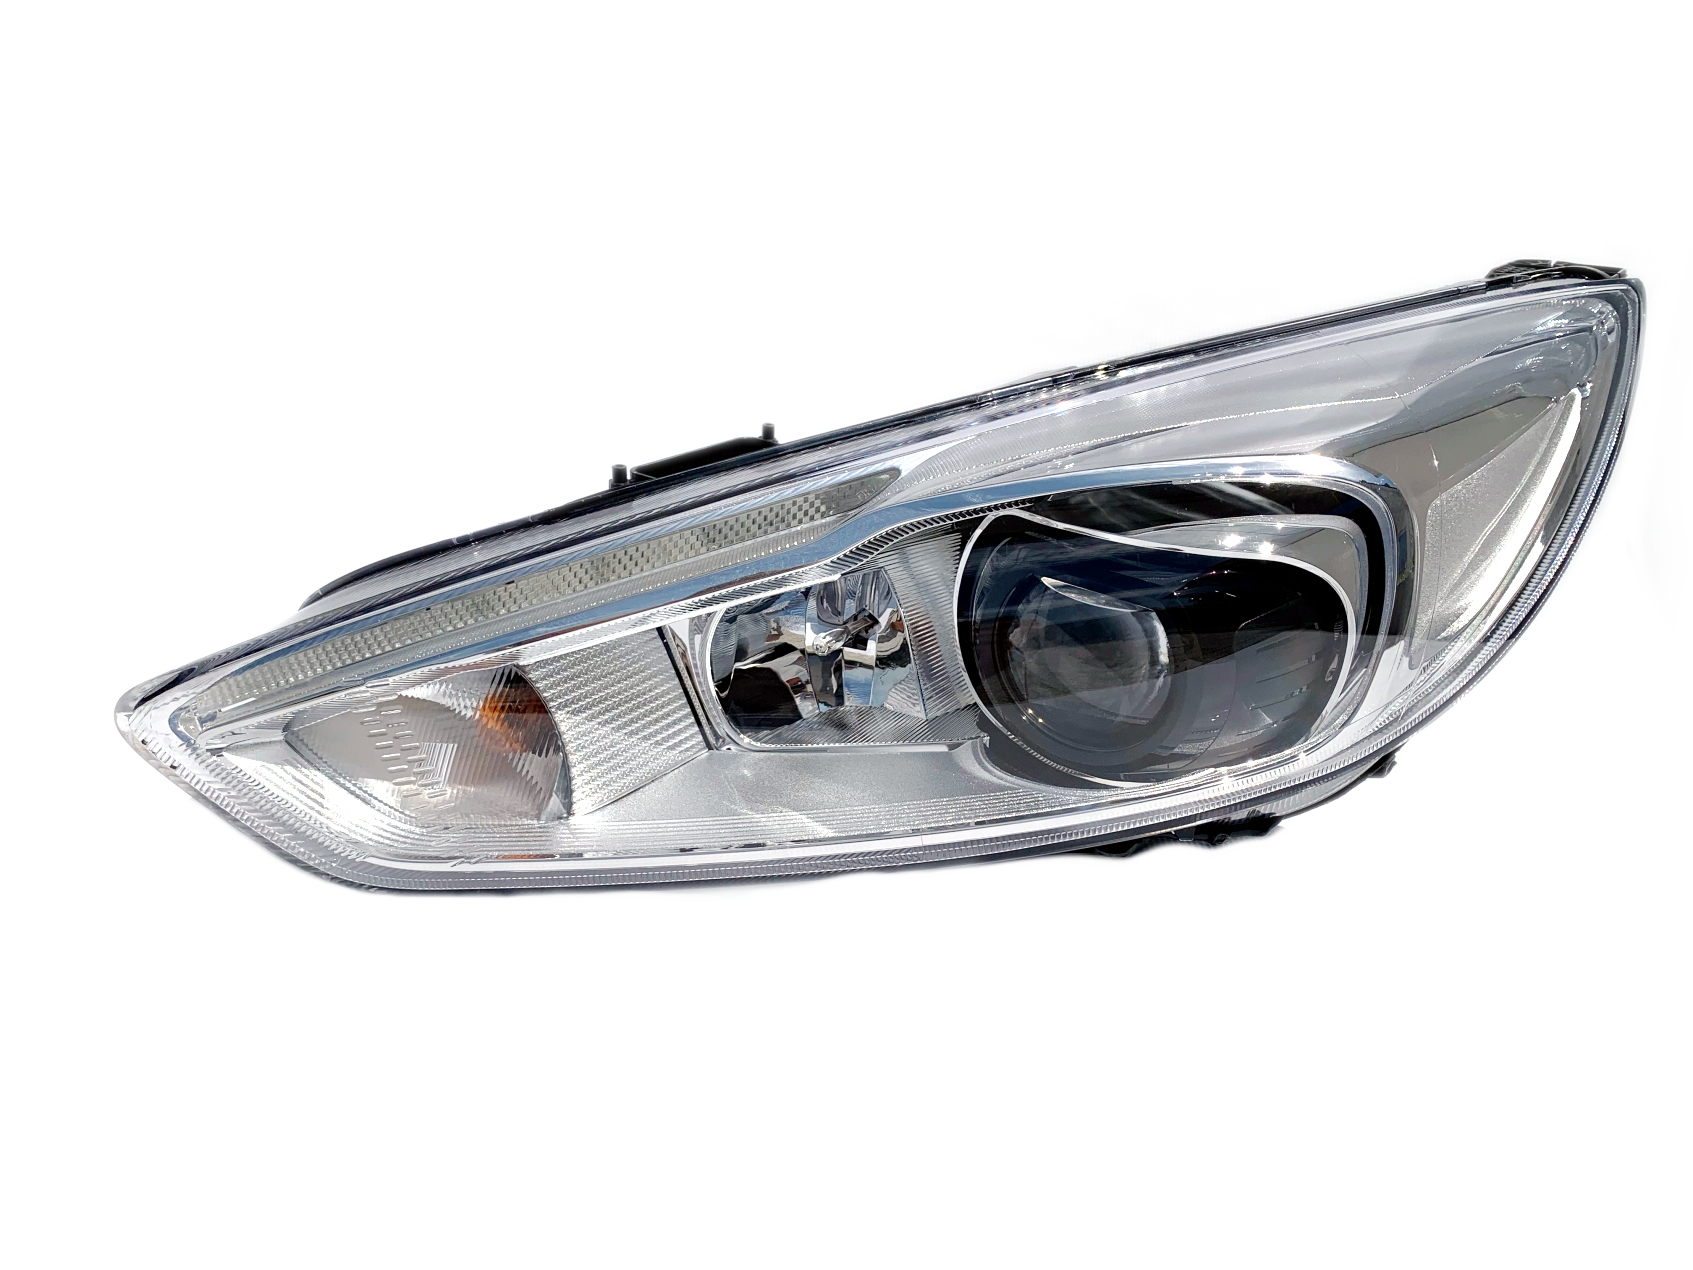 Nowy Oryginalny Reflektor Xenon Skretny Ford Focus Mk3 Lift F1eb 13d155 Ag Magdatom Car Tomasz Kaczalko Premium Car Parts